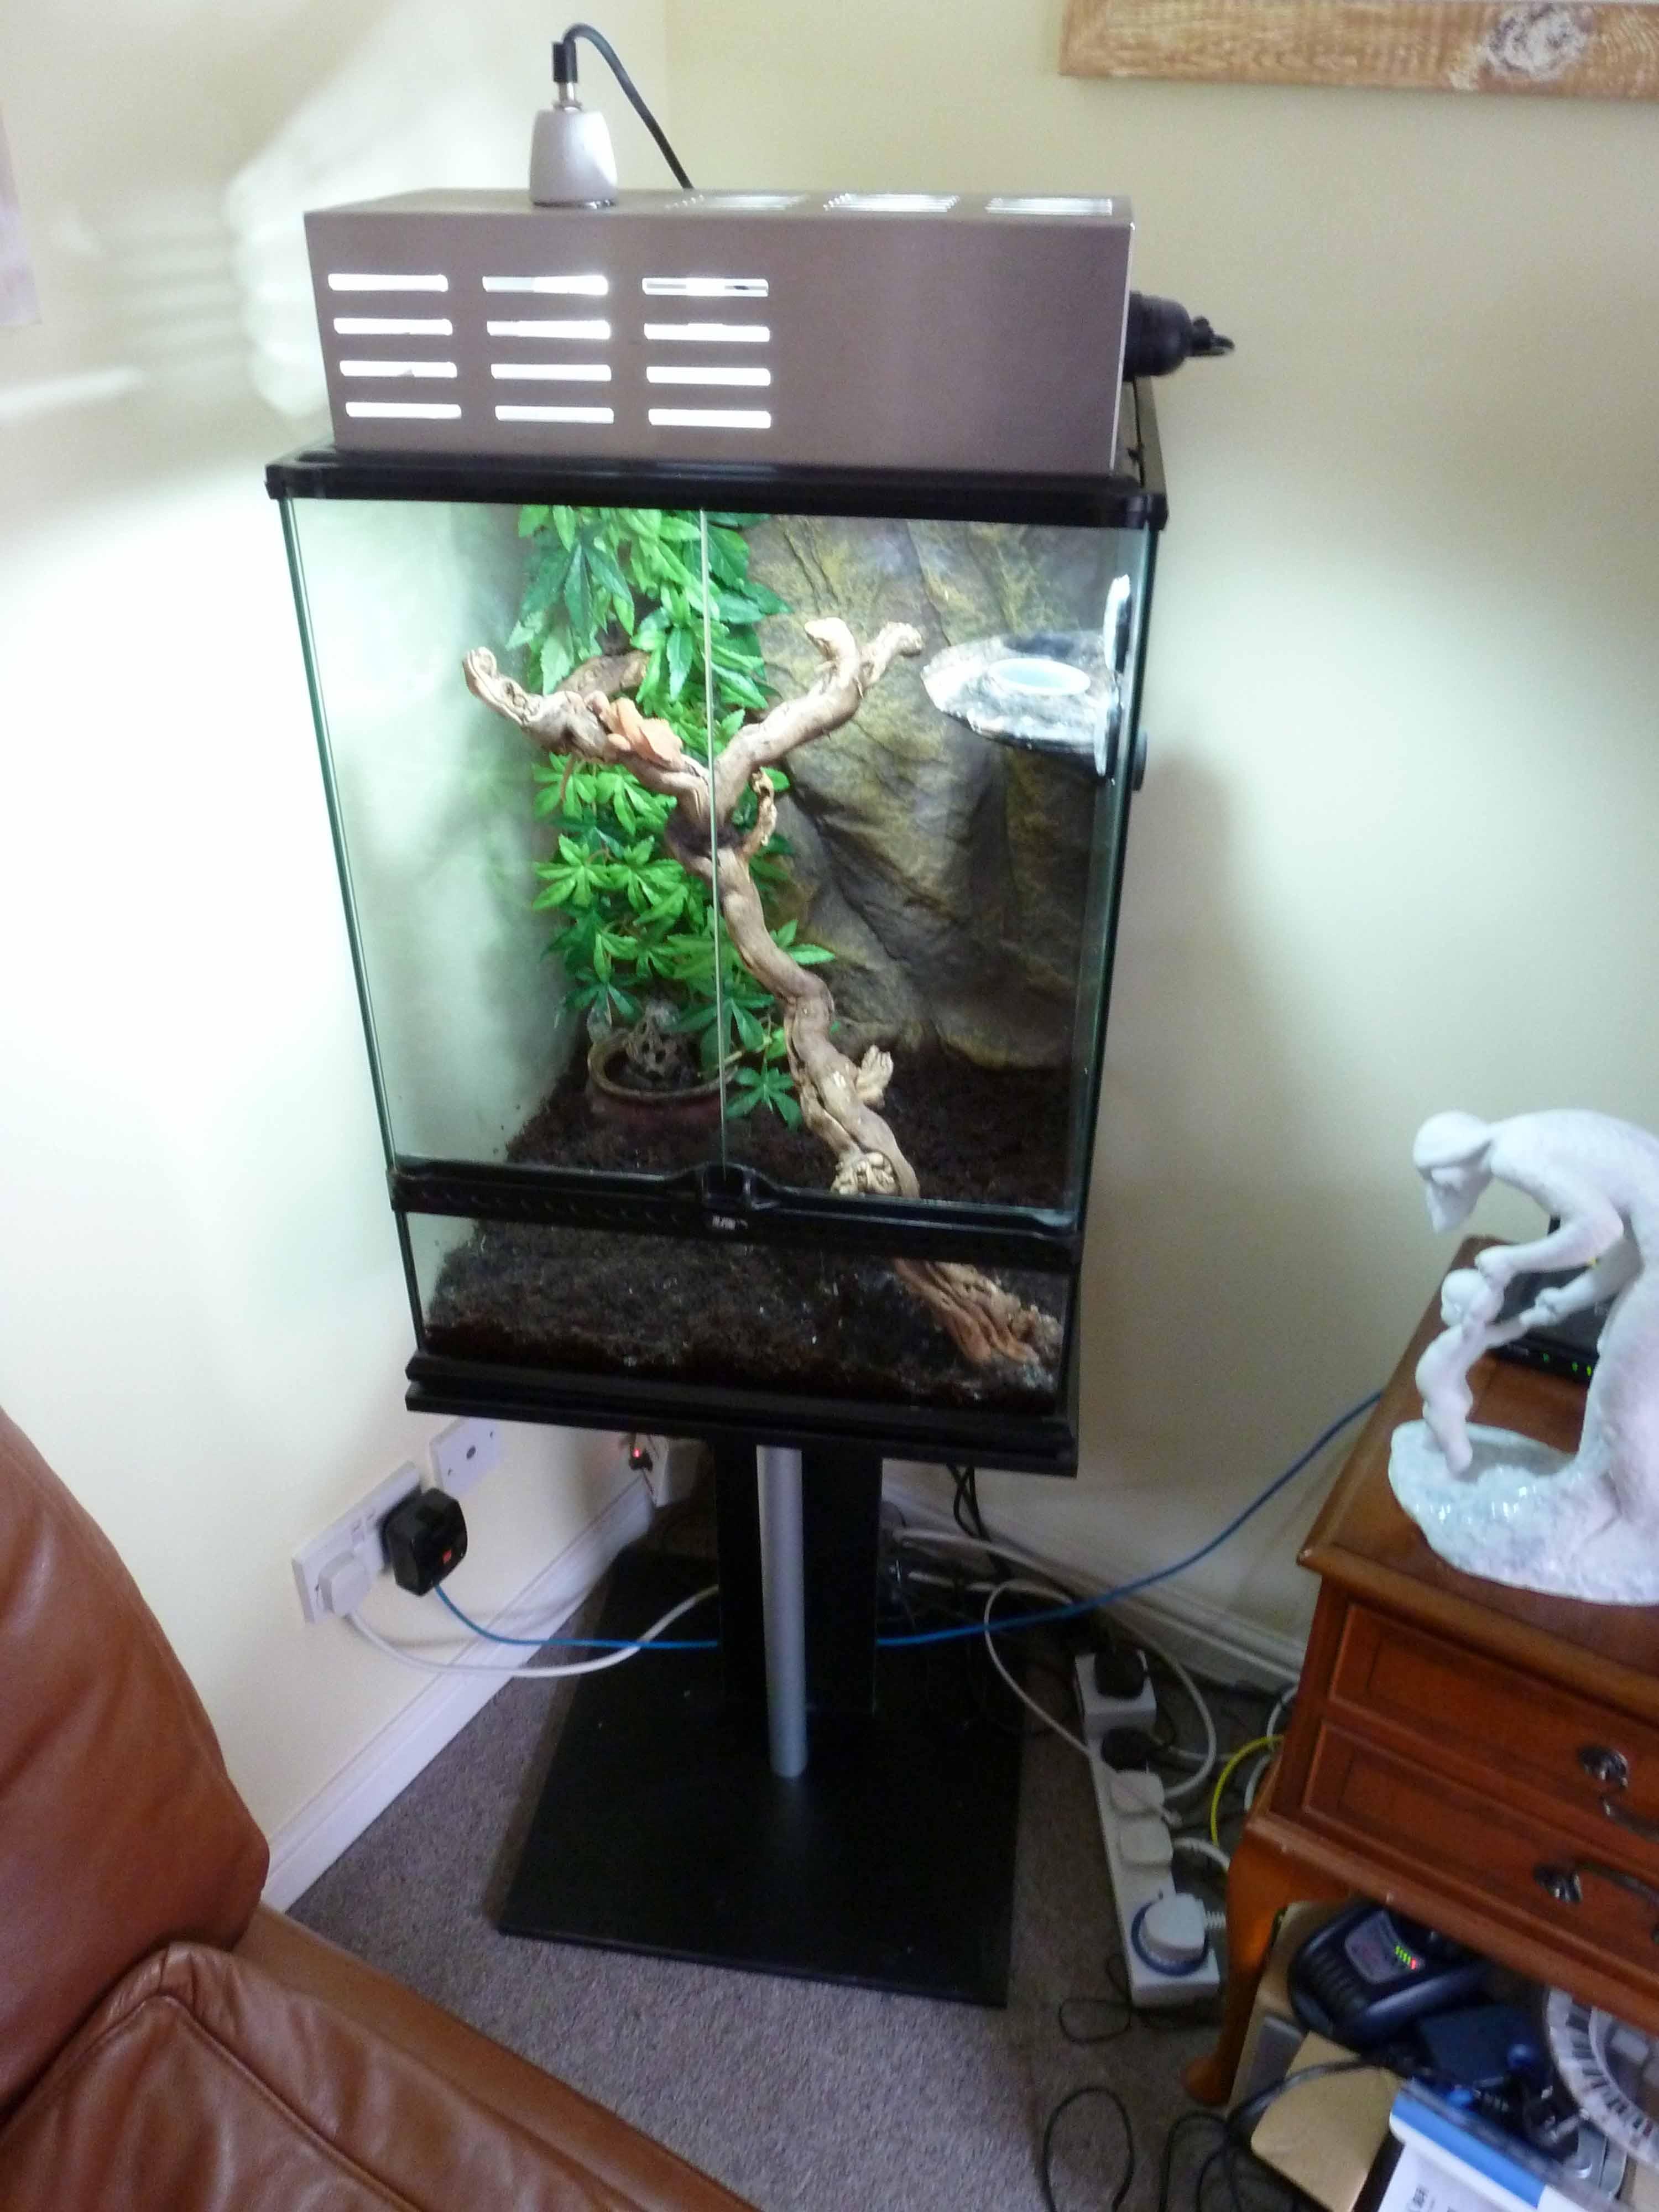 E Midlands Full Crested Gecko Setup With Crested Gecko